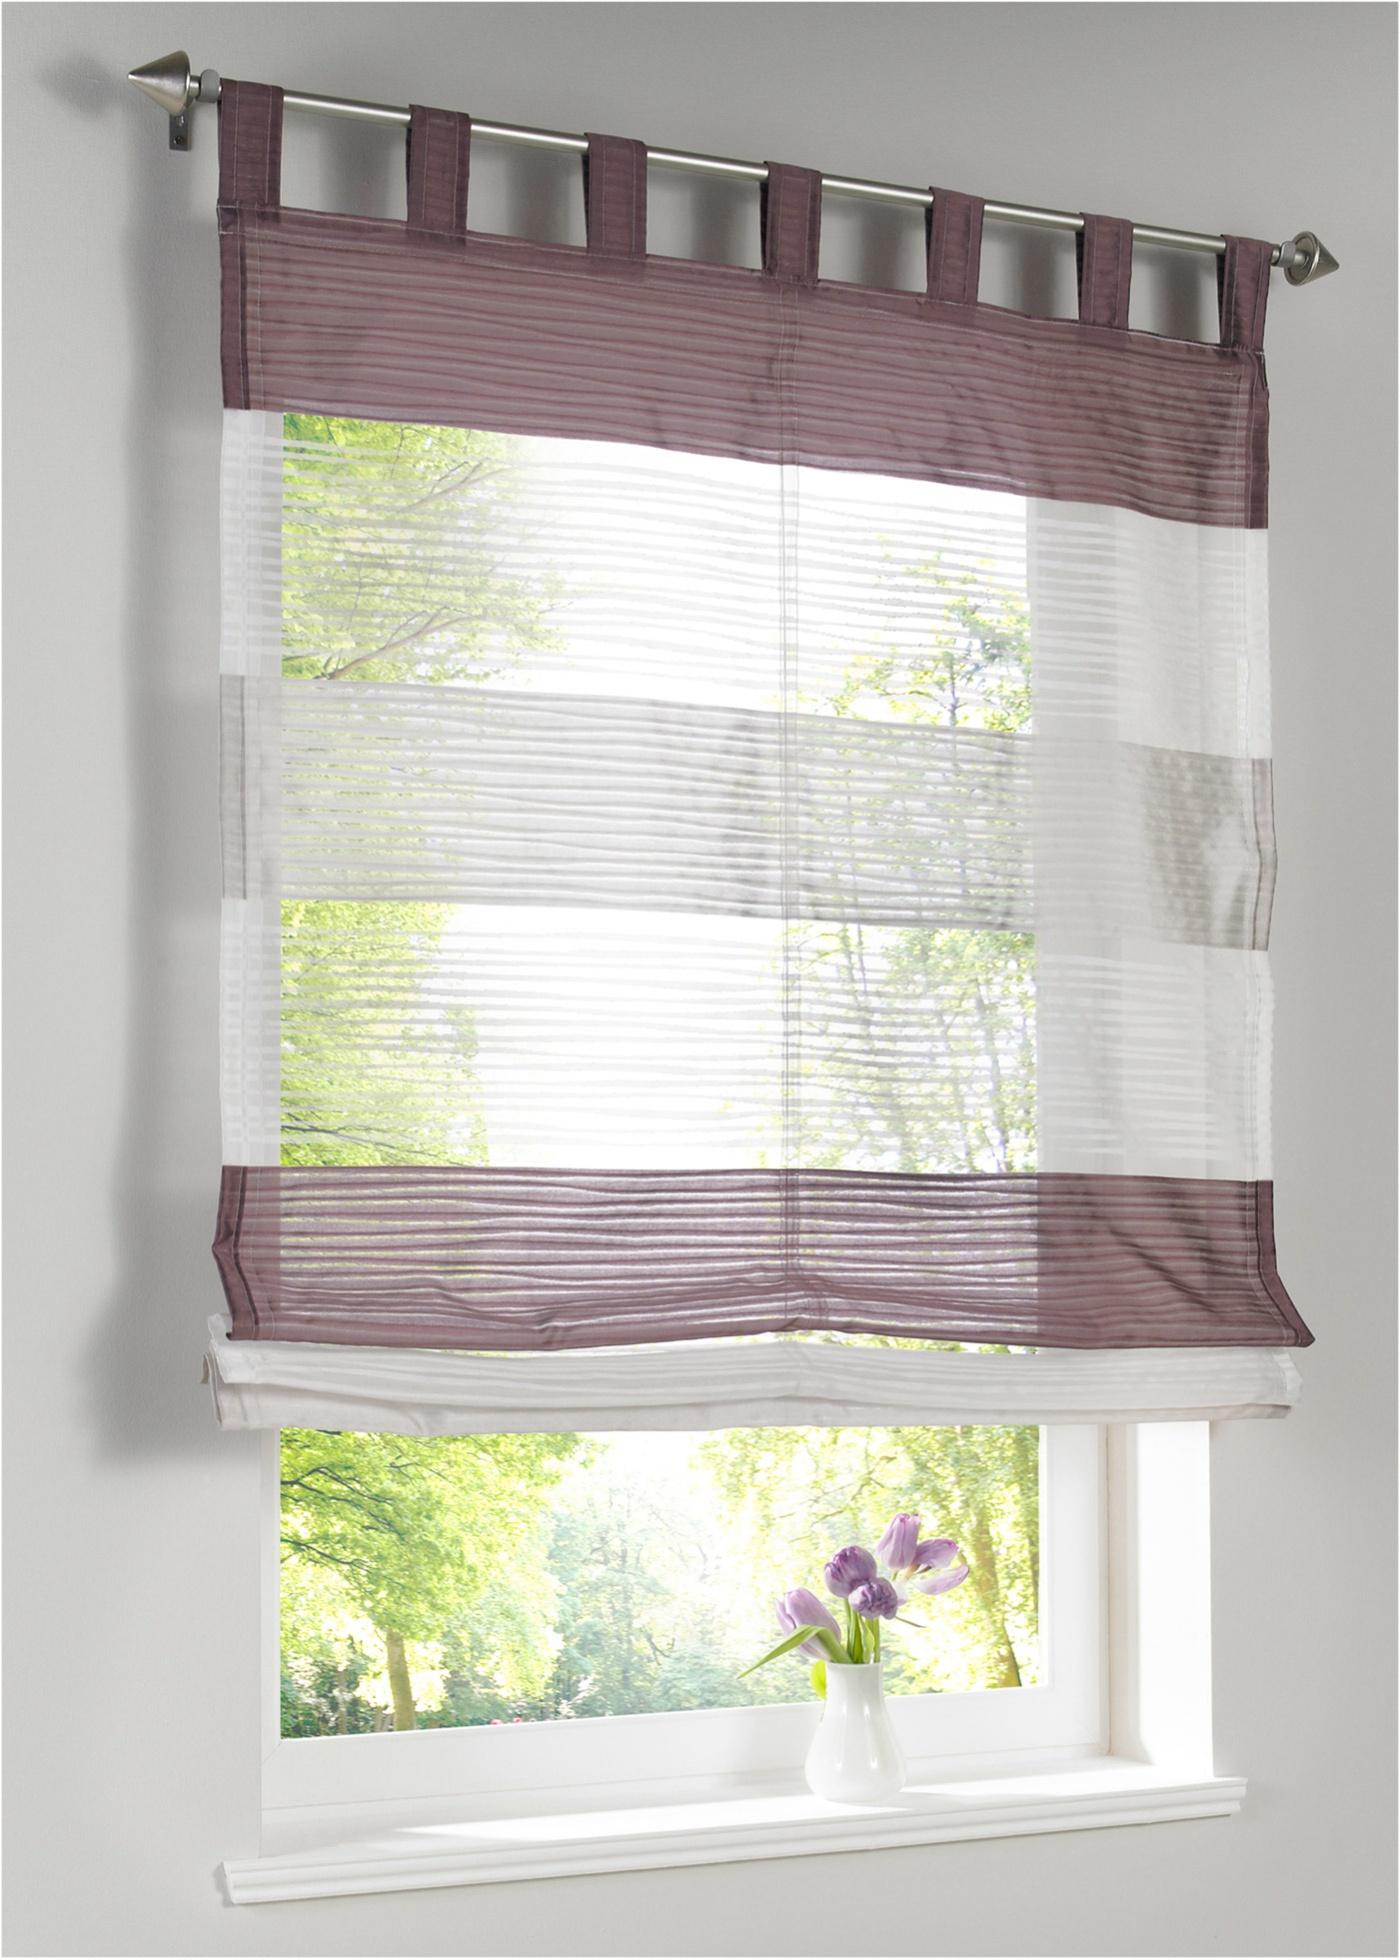 raffrollo gardinen lila preisvergleiche. Black Bedroom Furniture Sets. Home Design Ideas